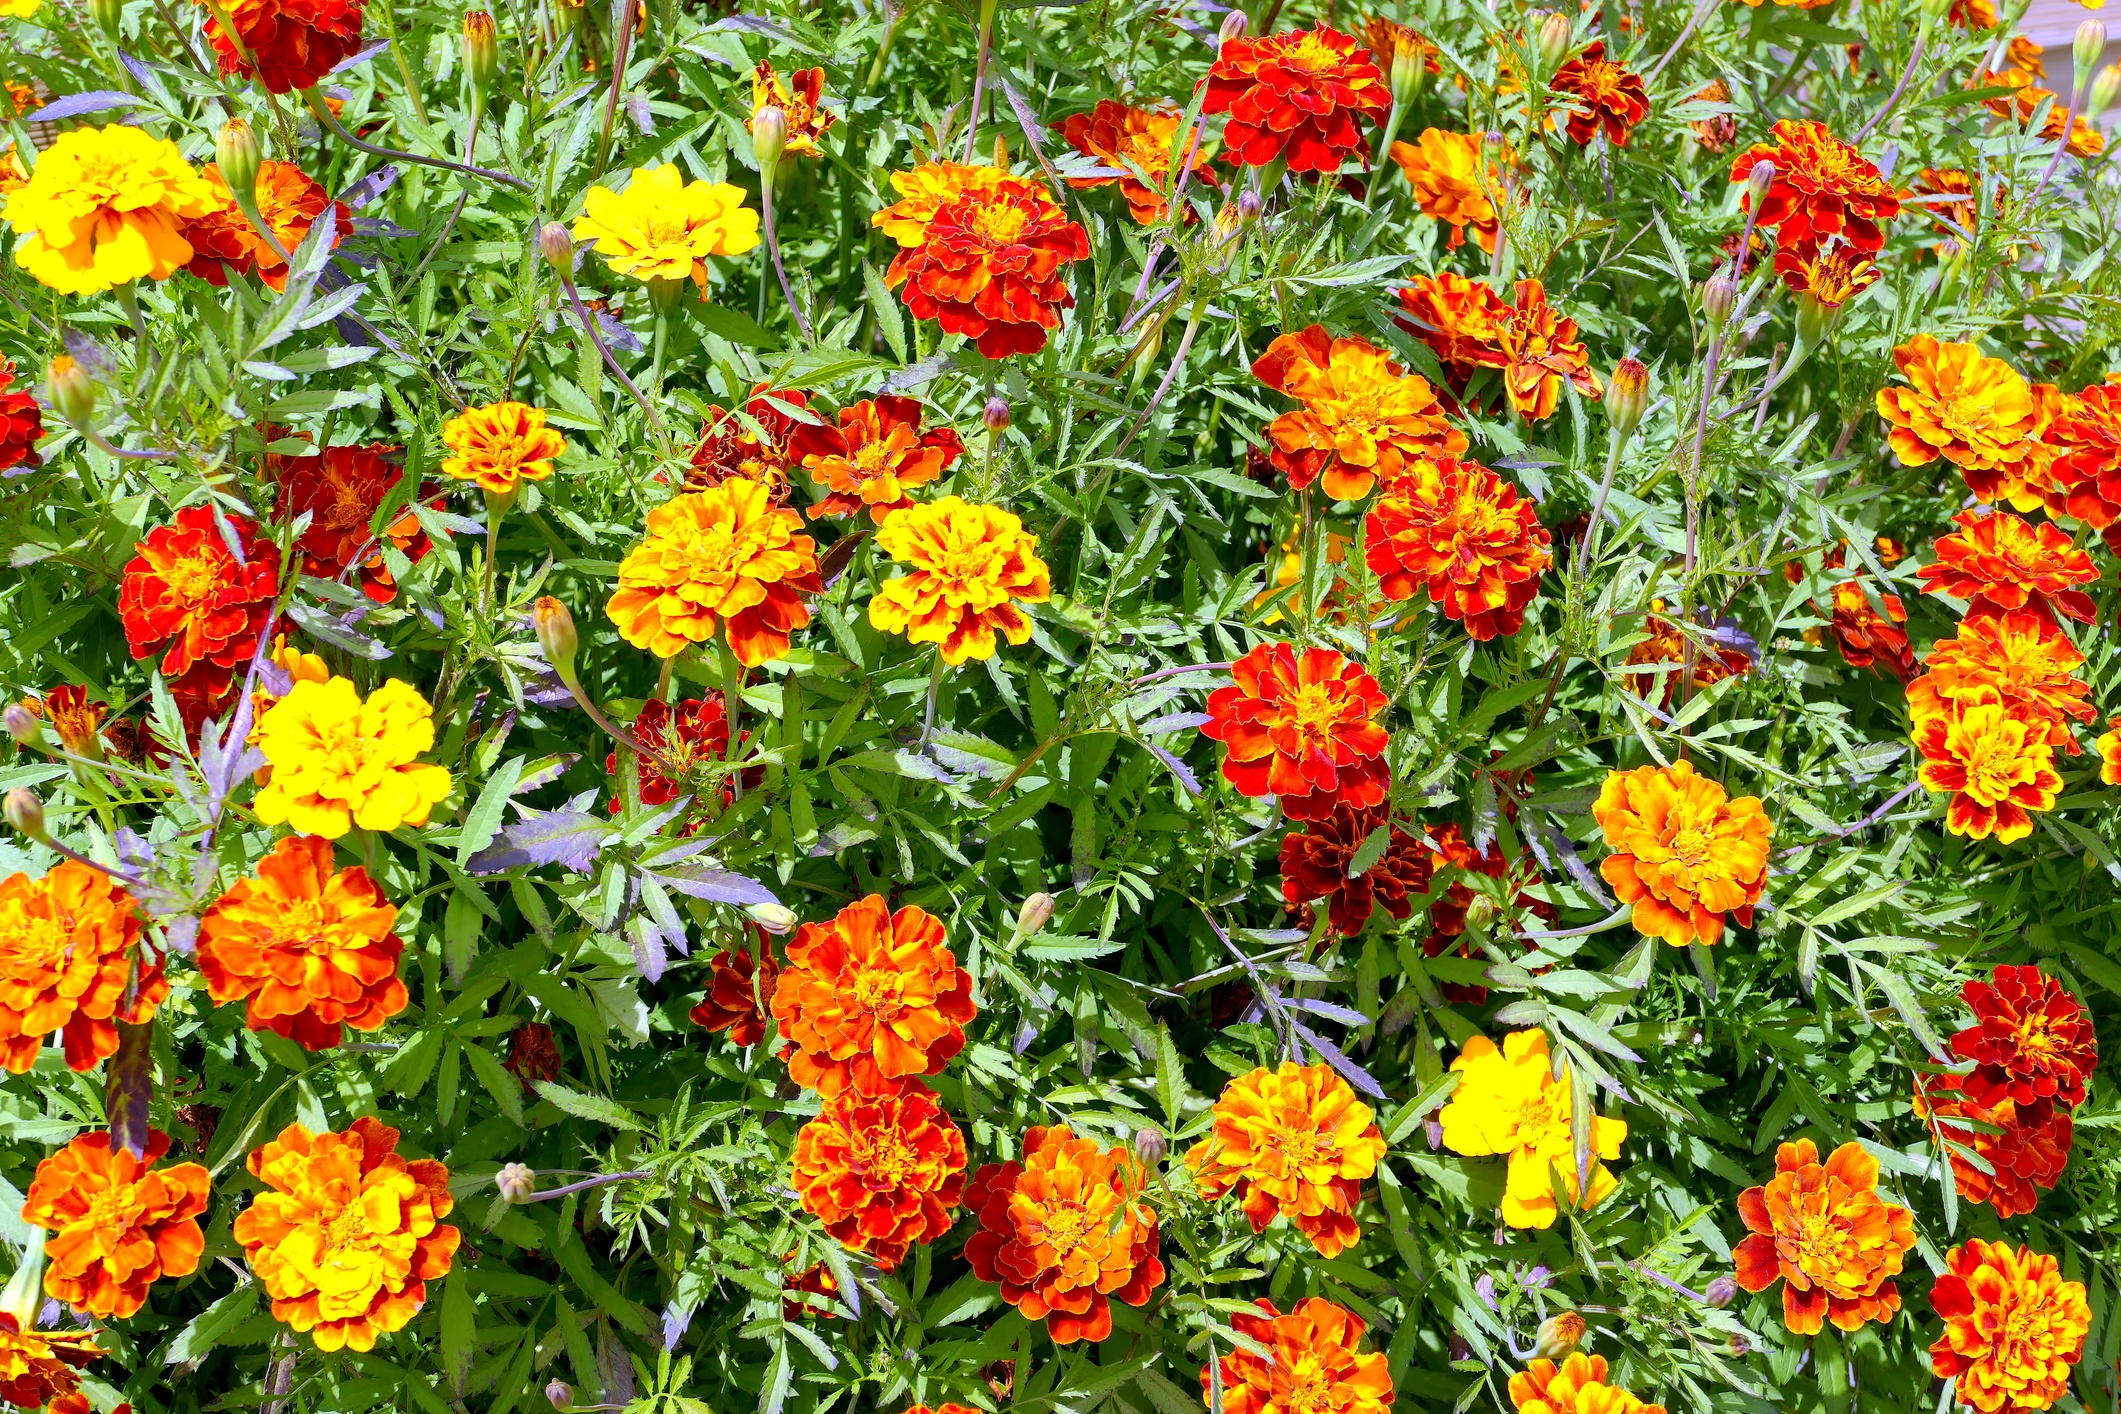 Spring-flower-planting-marigolds.jpg